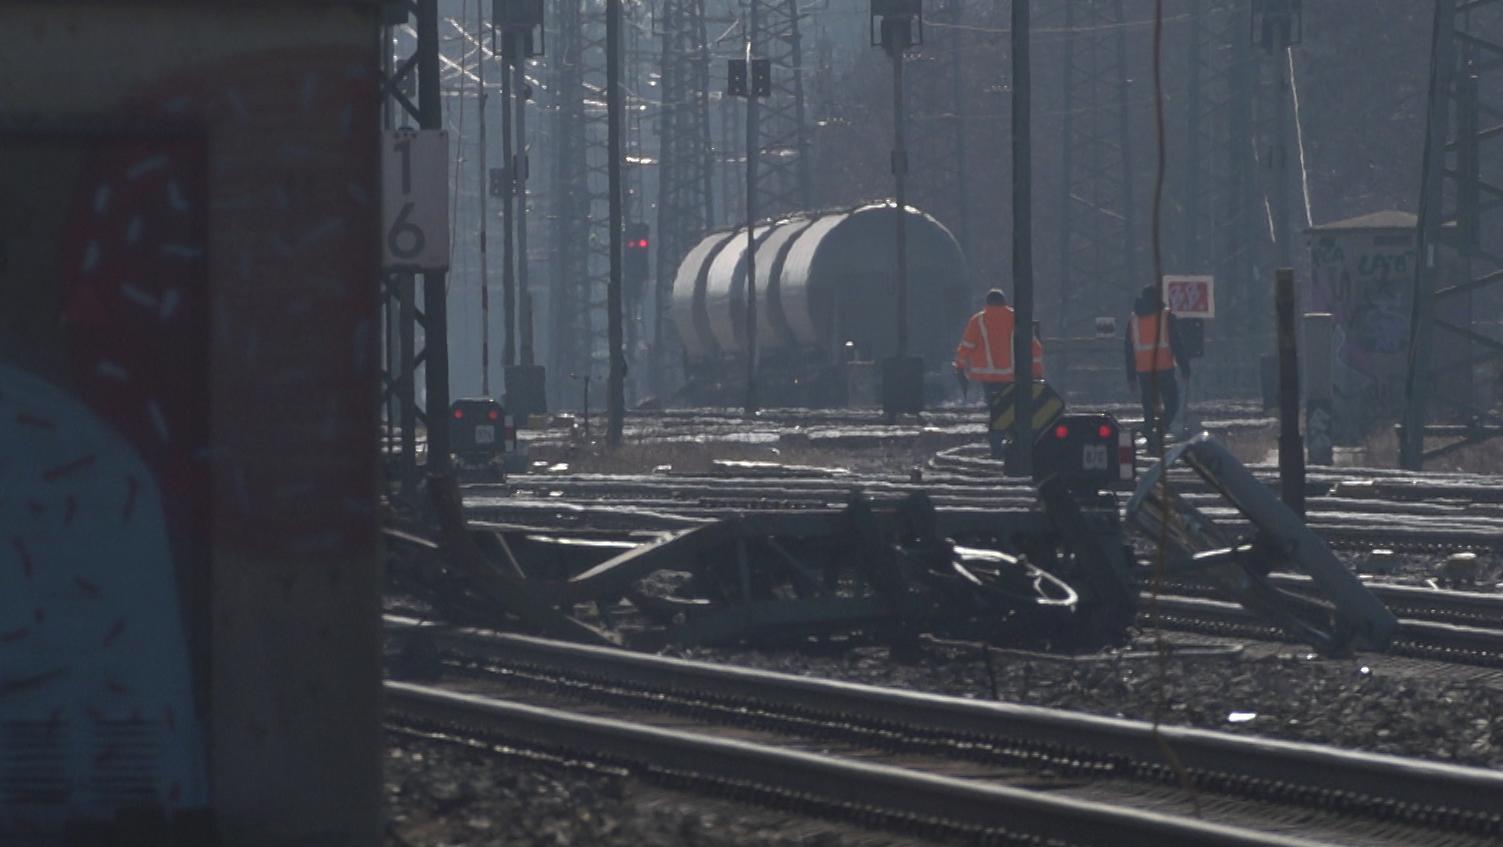 Waggons eines Güterzugs am Bahnhof Augsburg-Oberhausen